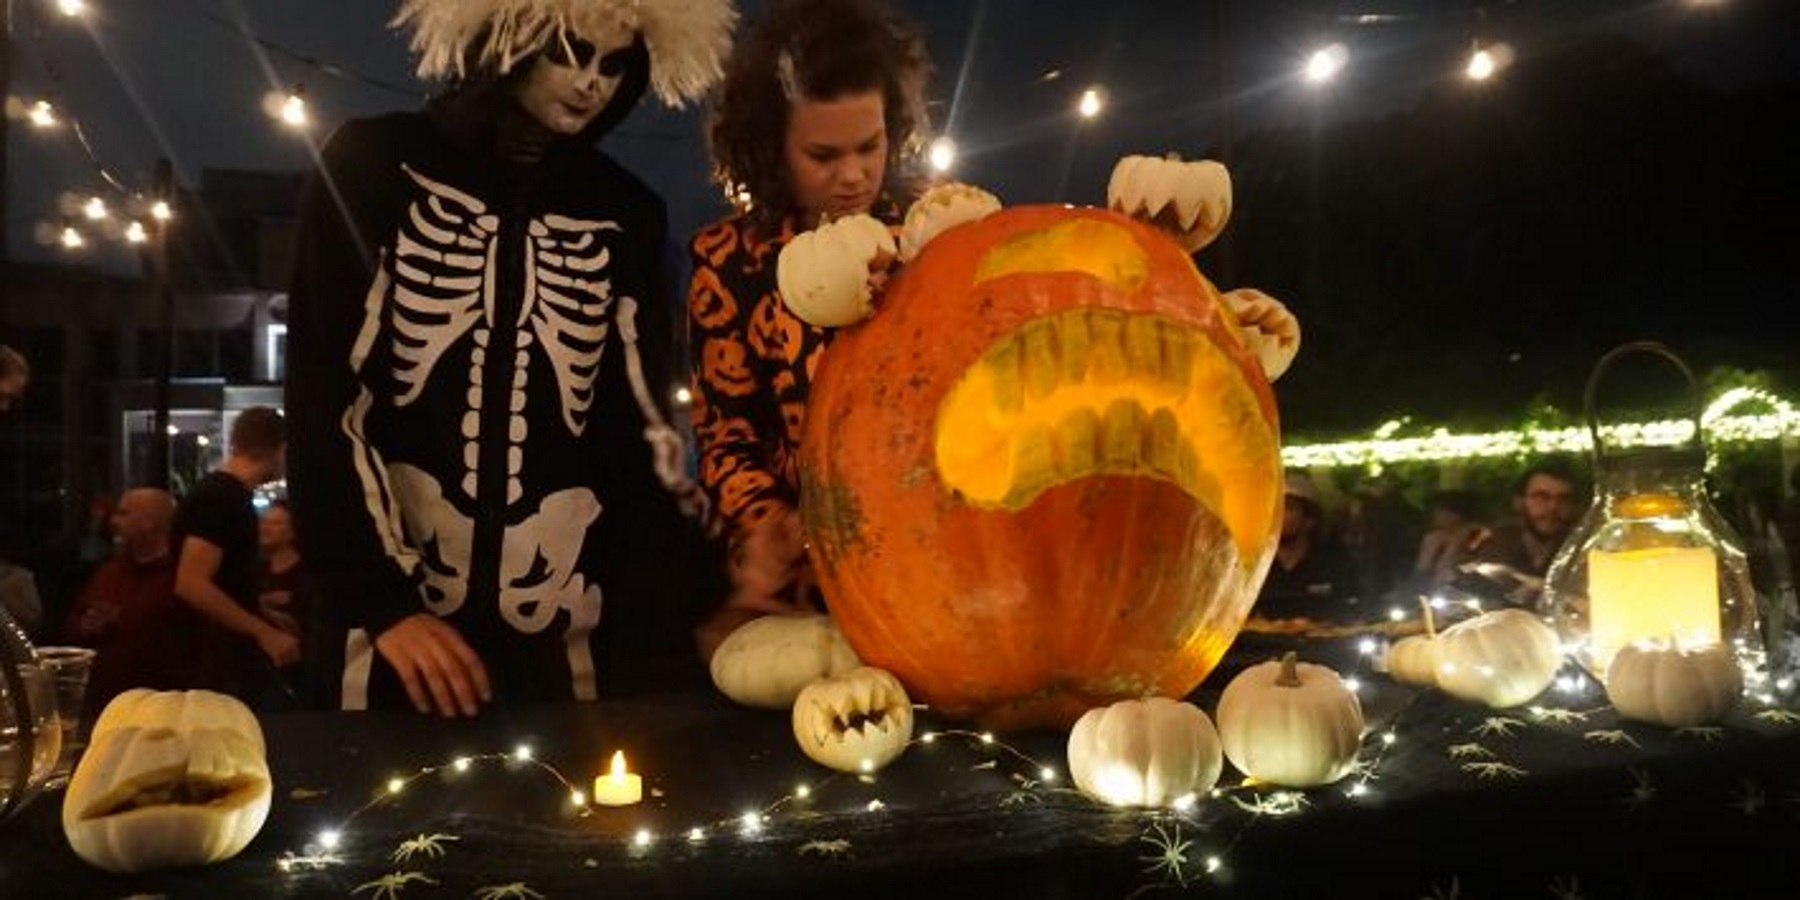 Botanical Garden Pumpkin Carving contest